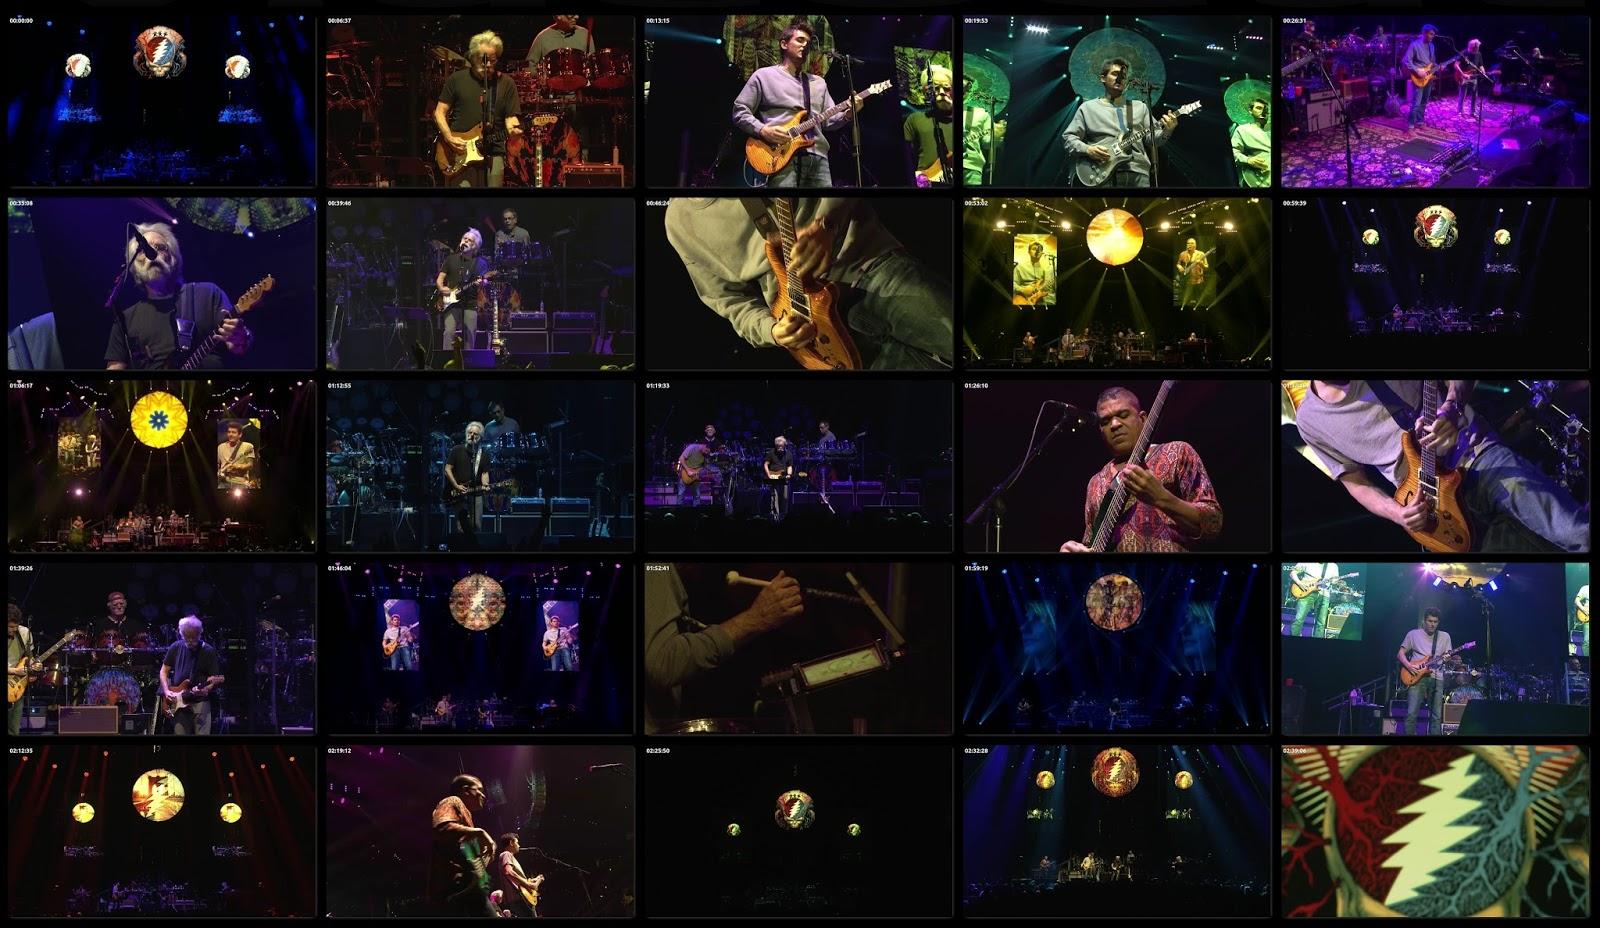 The Curtain With Dead Company 2017 11 19 Td Garden Boston Ma Webcast Rip